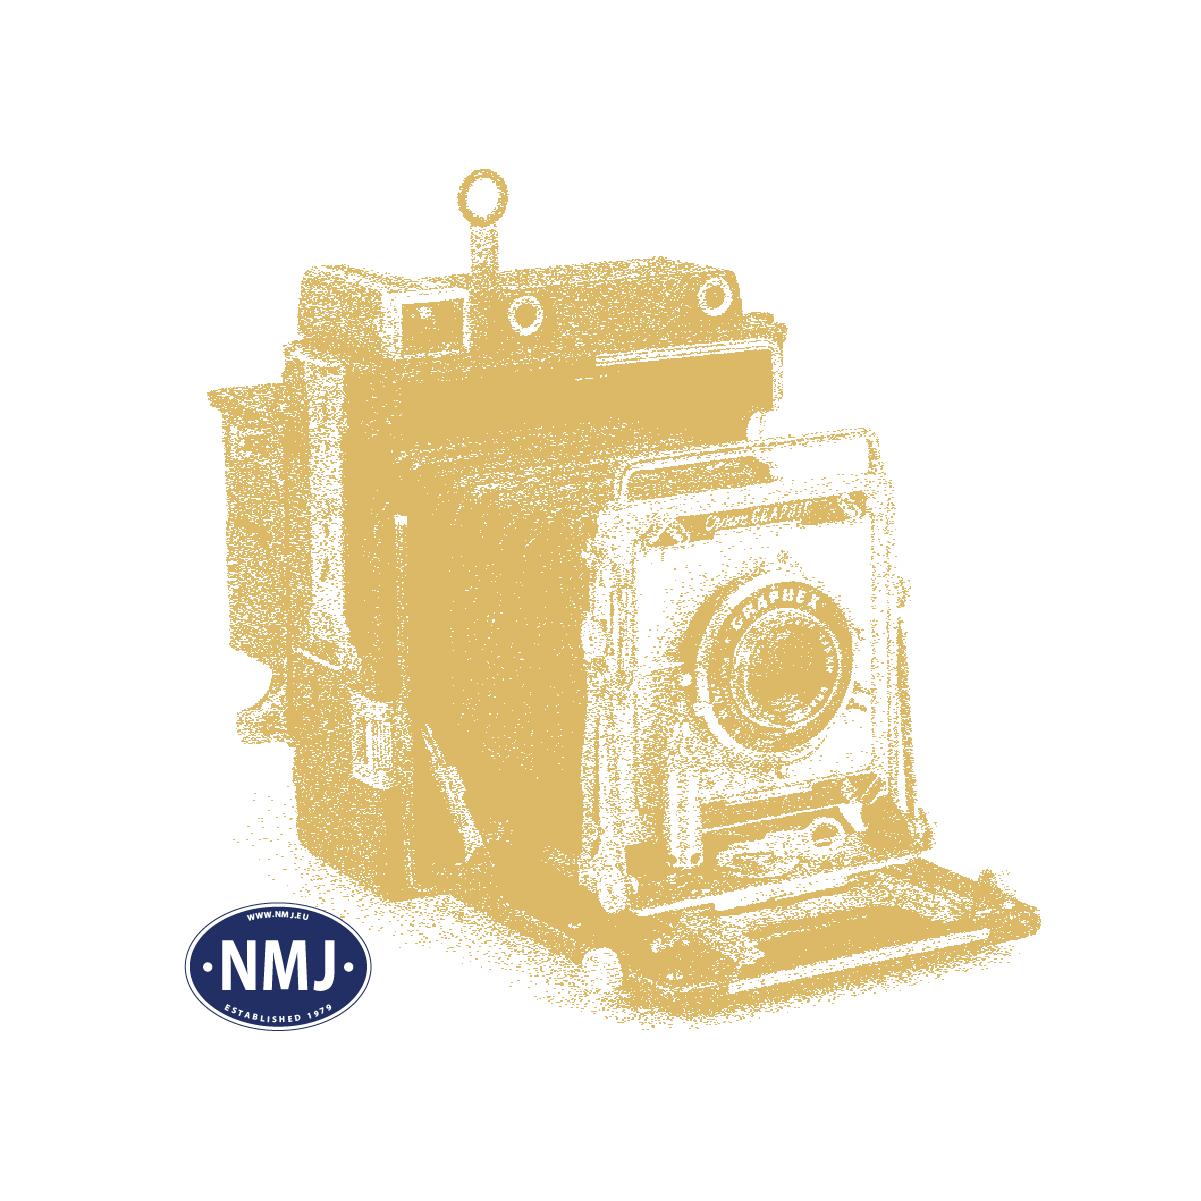 TAM74050 - Fine Pin Vise, 0,1 - 3,2 mm